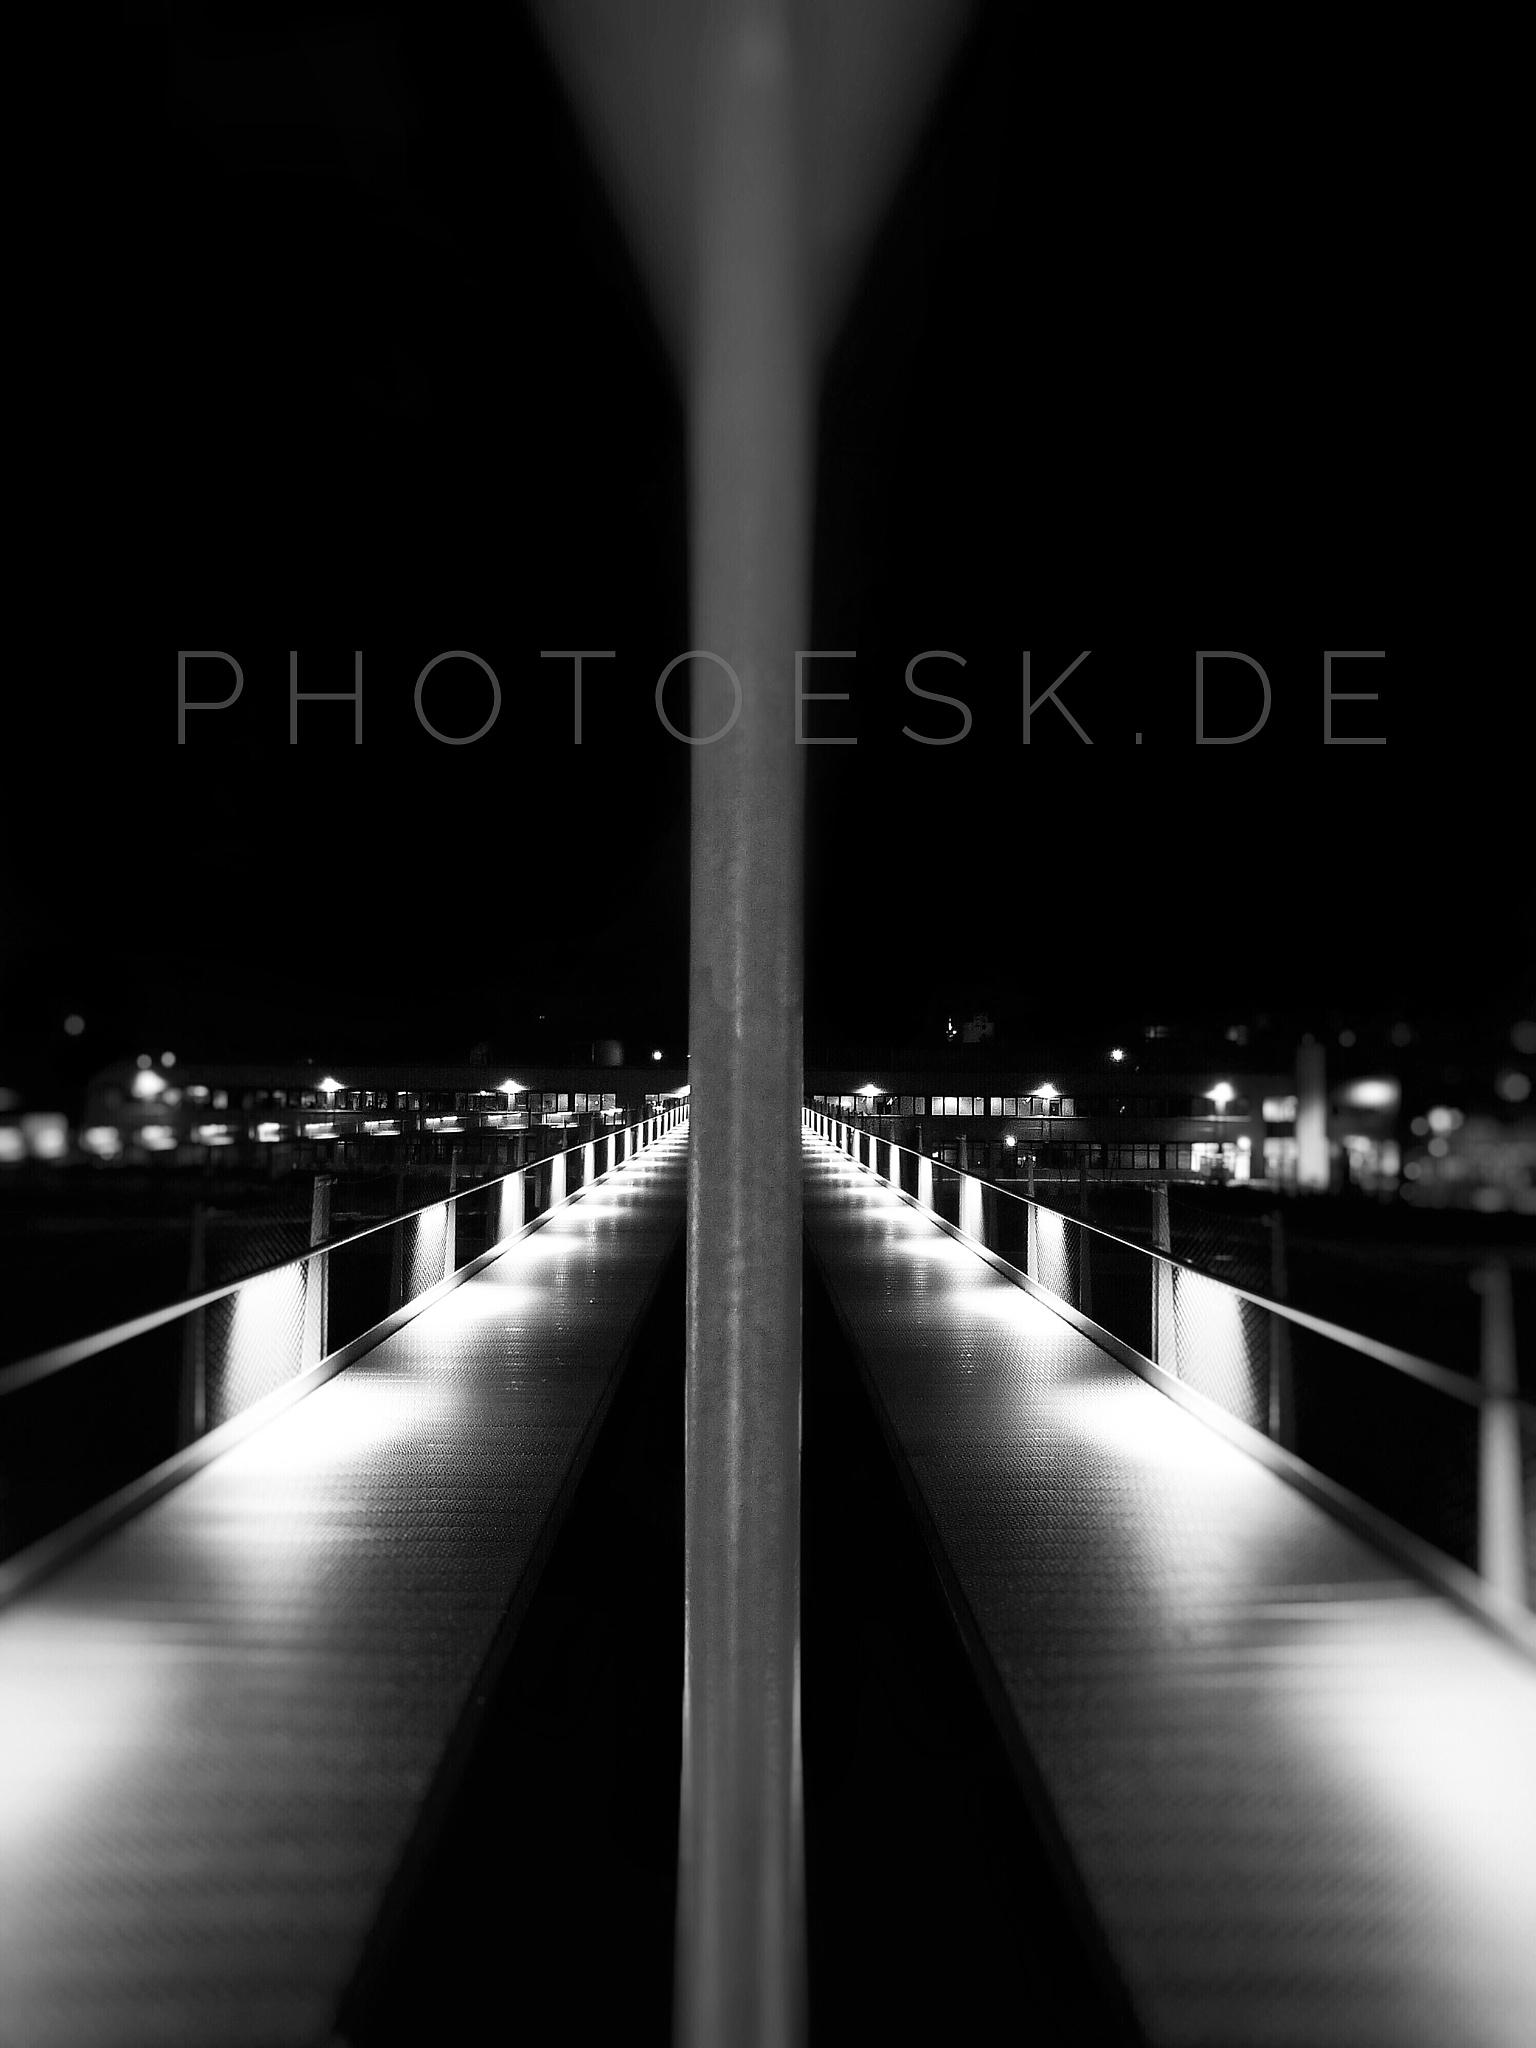 HundredOne by photoesk - just Art